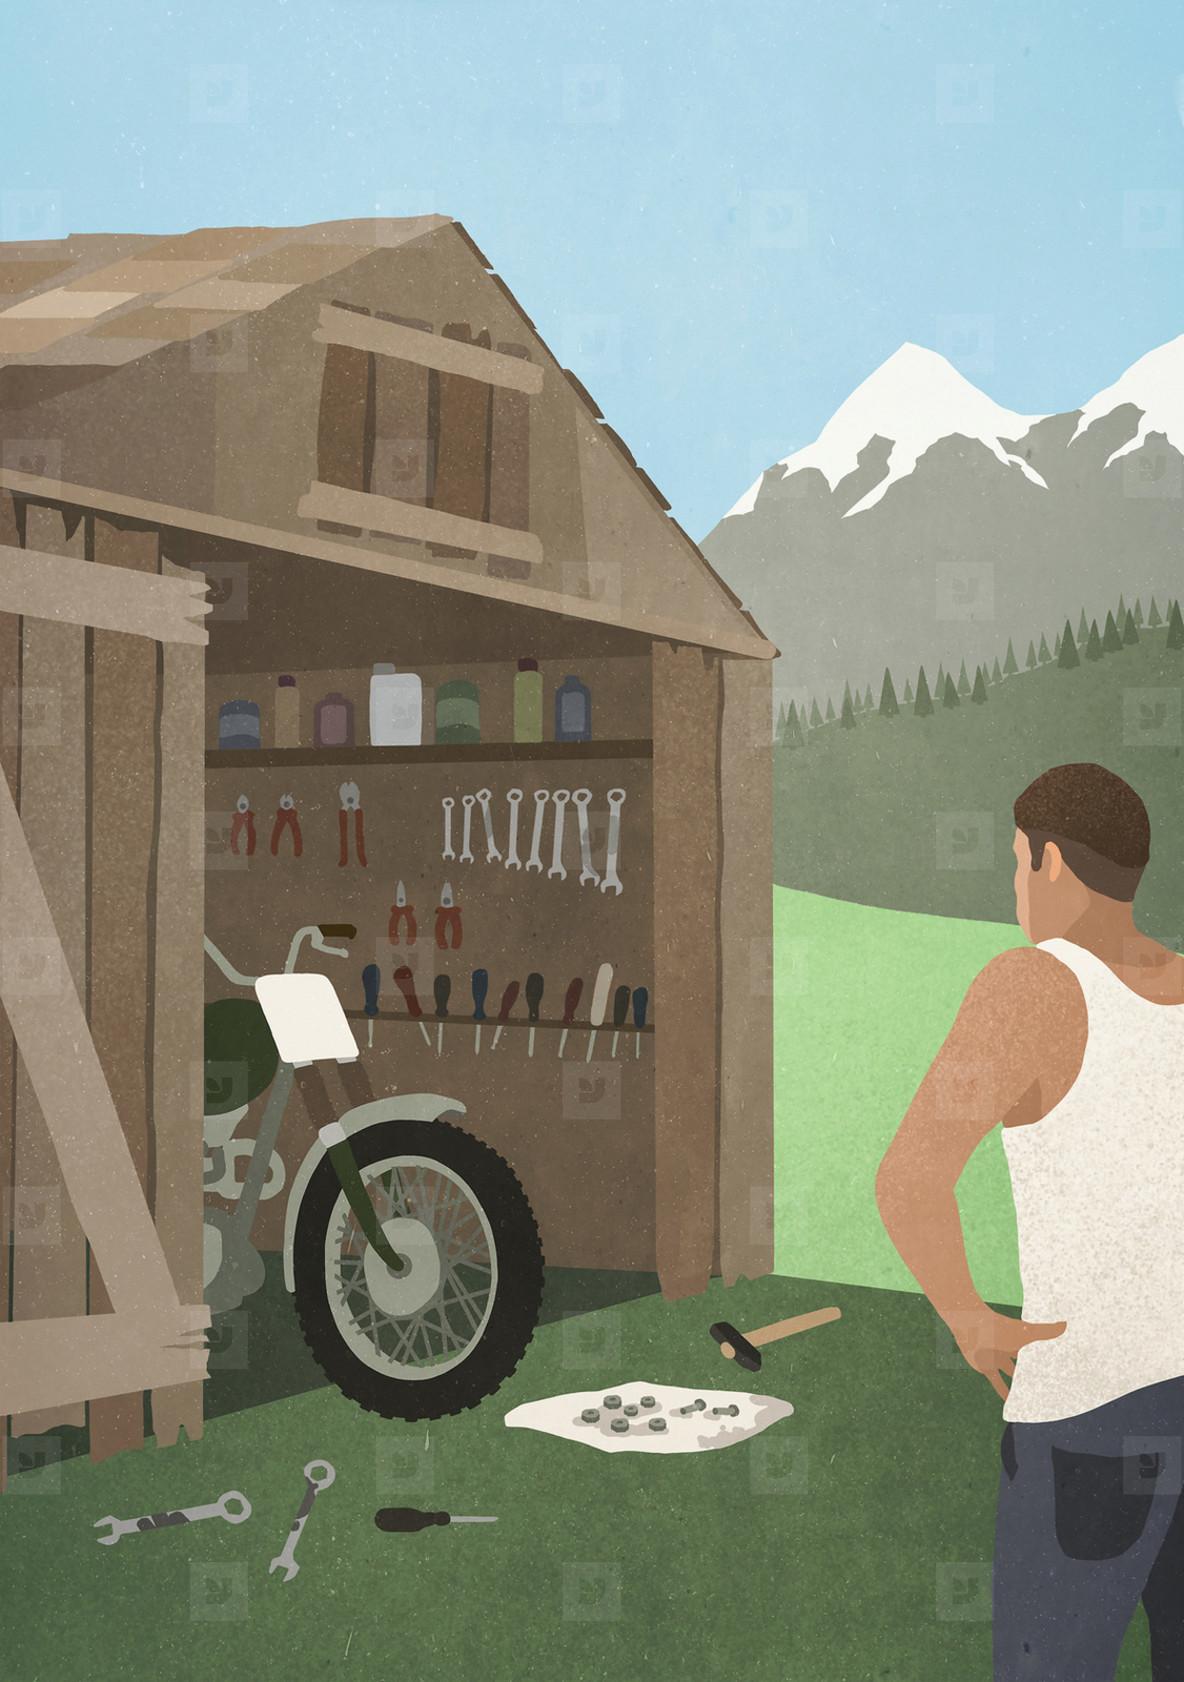 Man standing at garage shed  fixing motorcycle